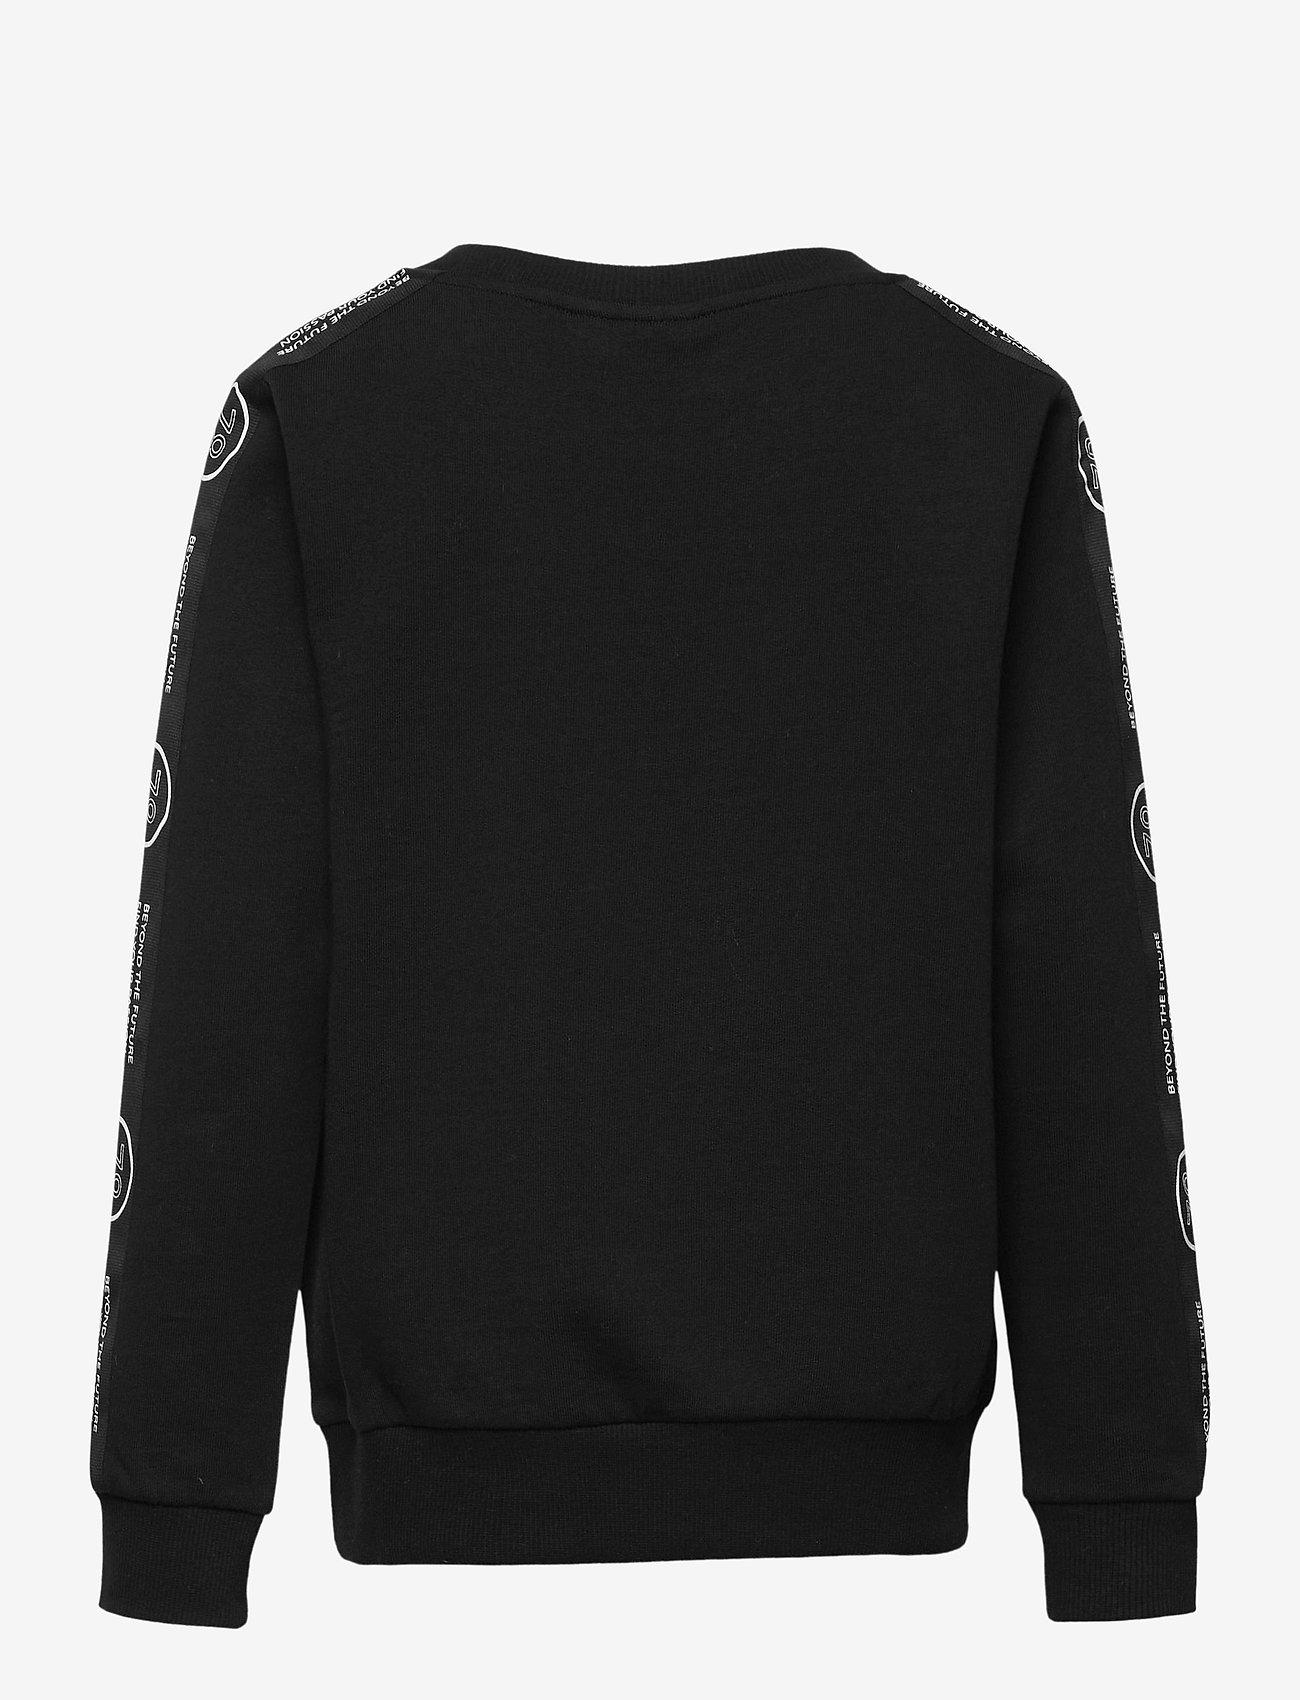 LMTD - NLMBRUNO LS SWEAT - sweatshirts - black - 1